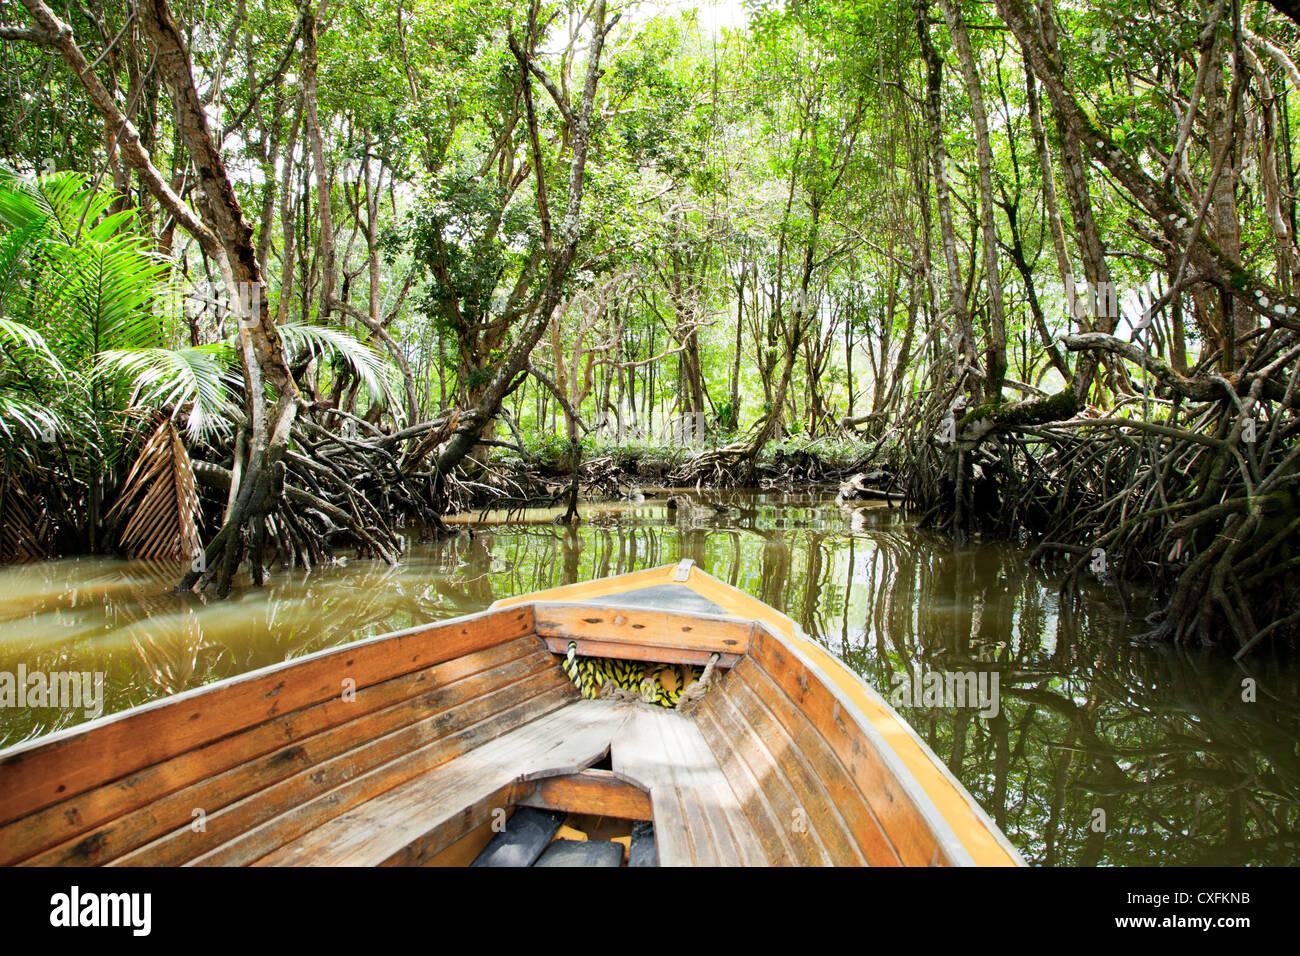 Mangrove forest near Bandar Seri Begawan, Brunei - Stock Image